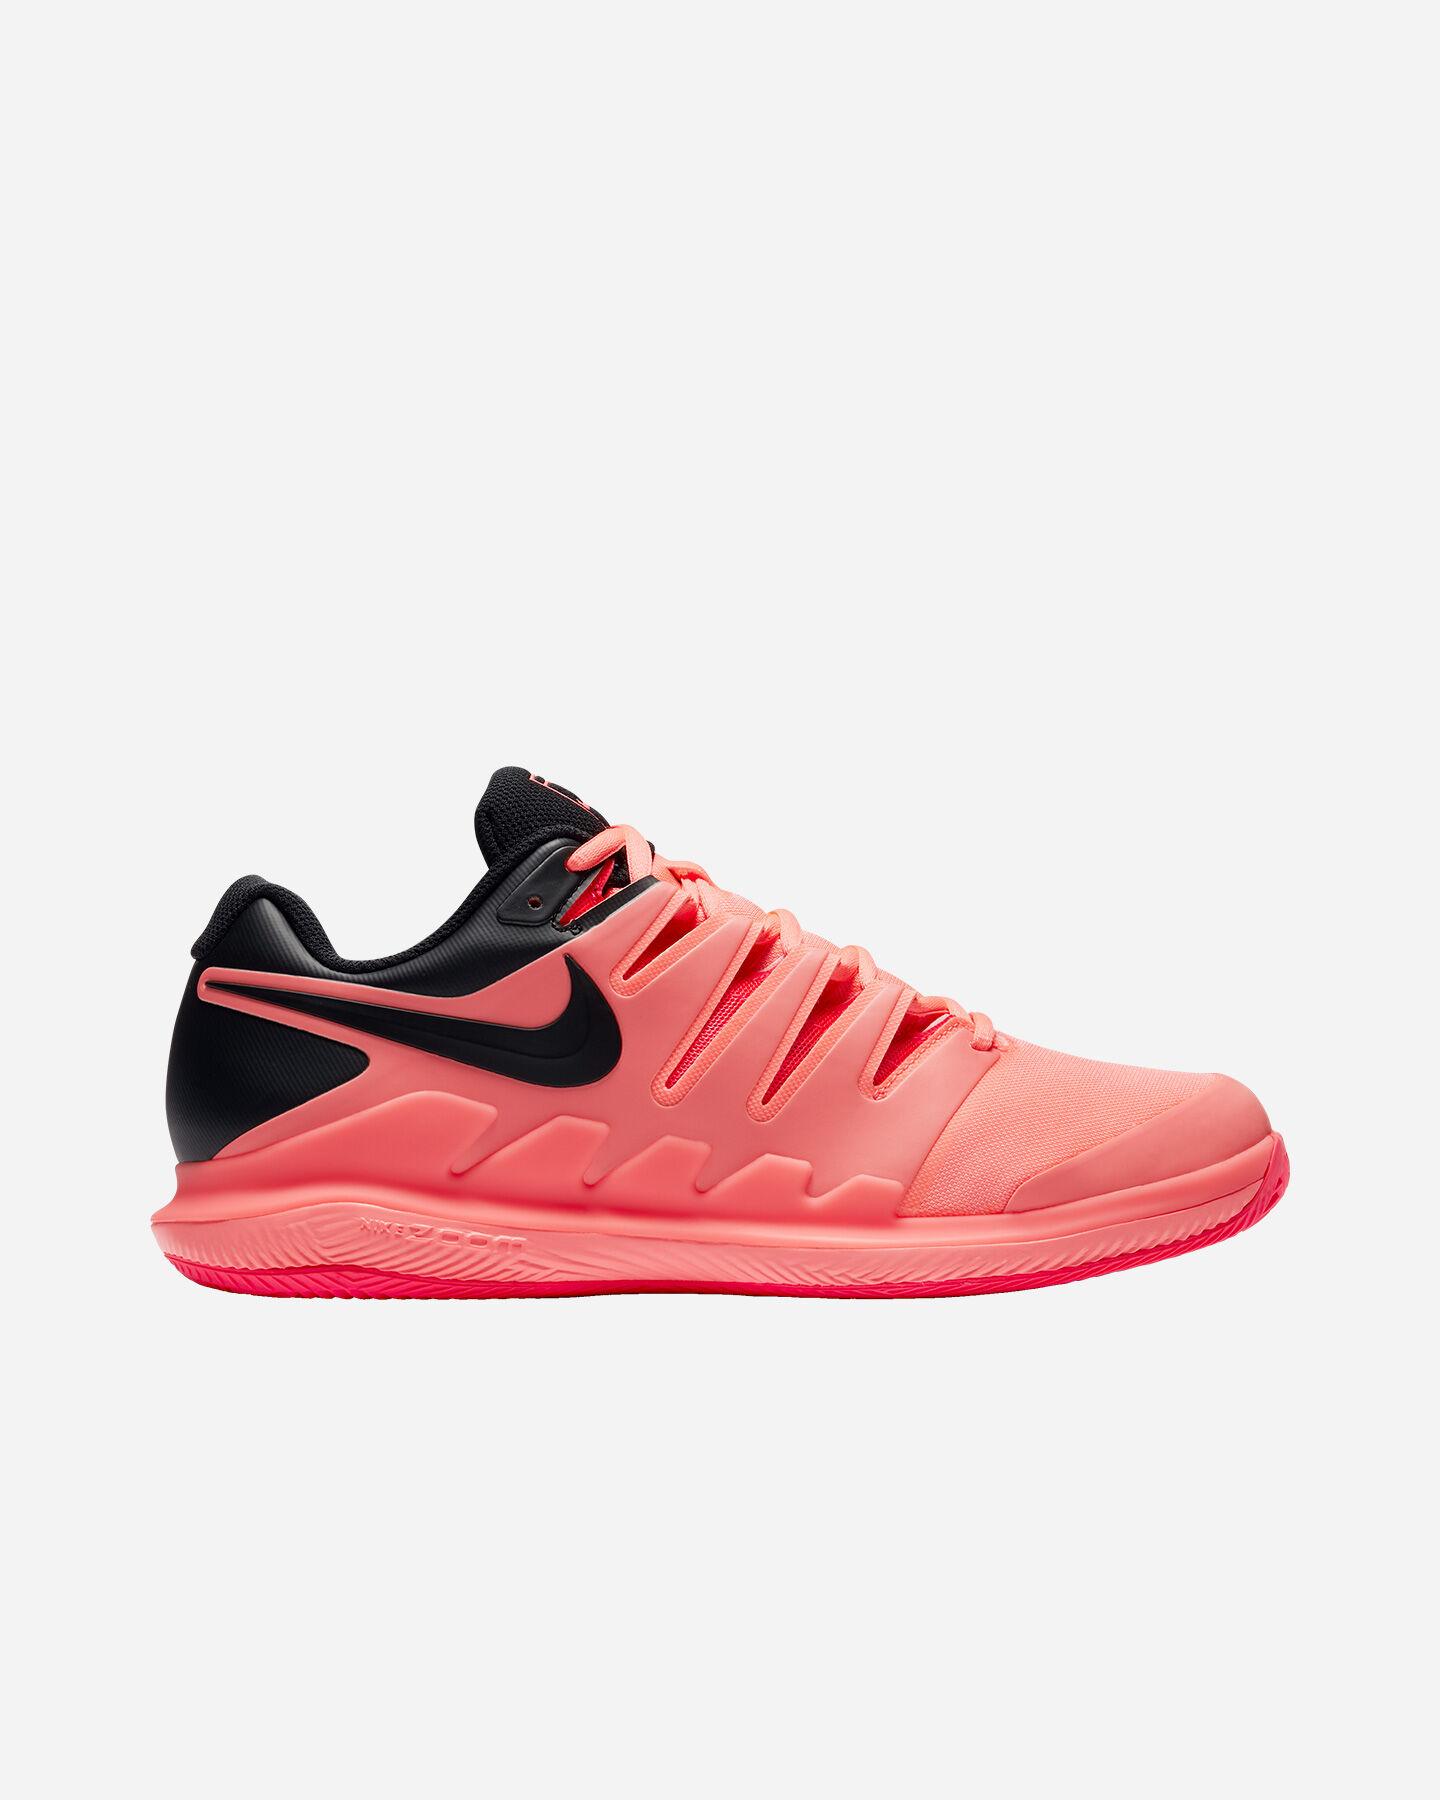 scarpa tennis nike